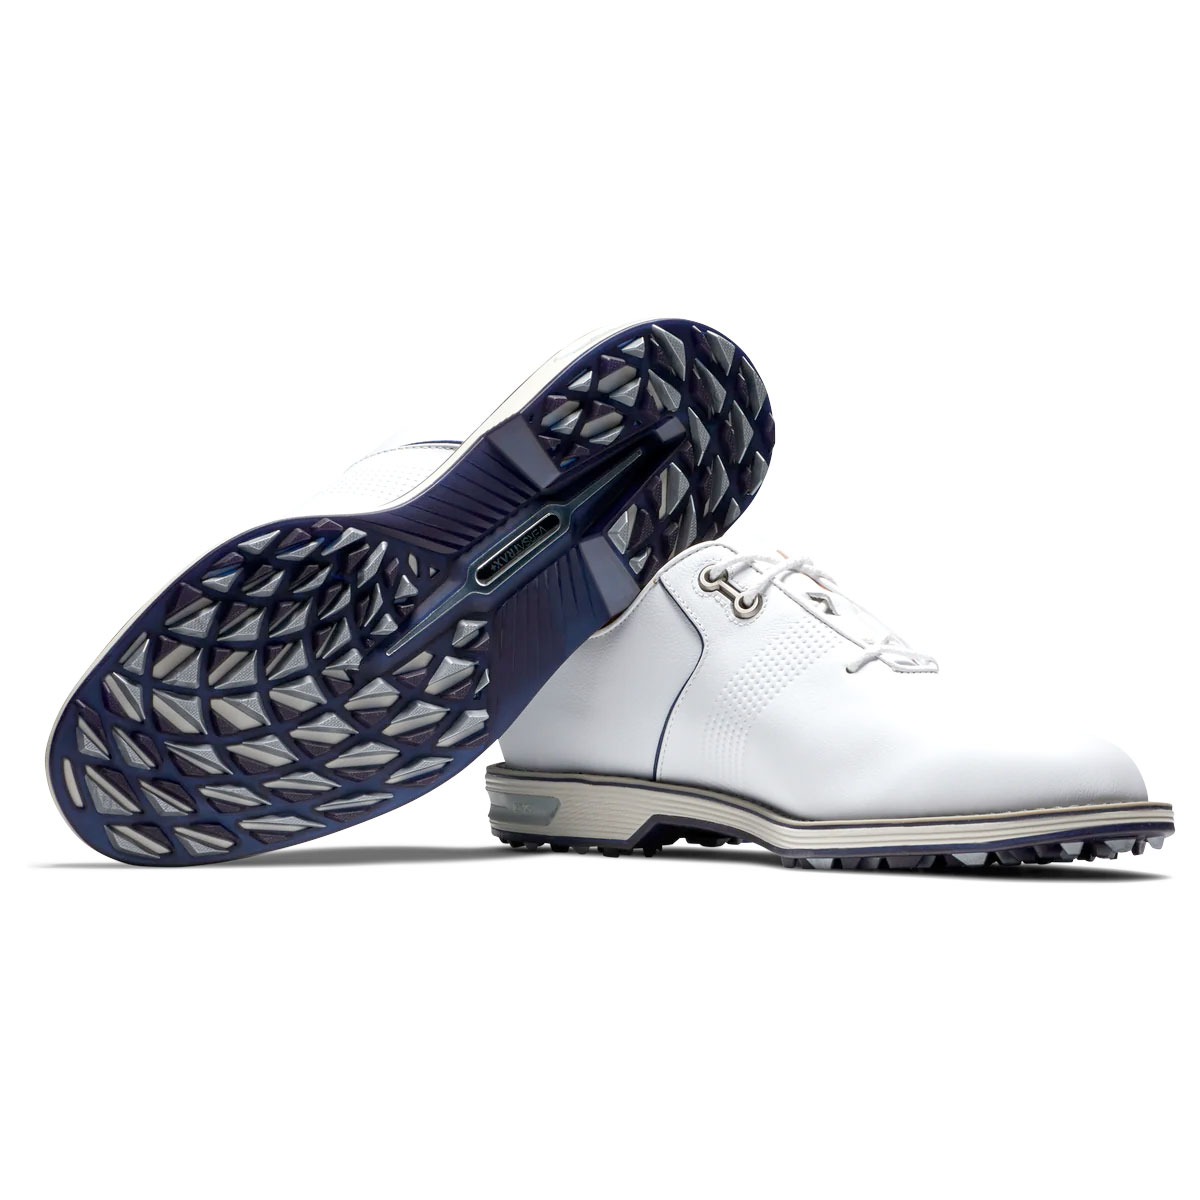 FootJoy Dryjoys Premiere Series Flint Mens Spikeless Golf Shoes  - White/Navy